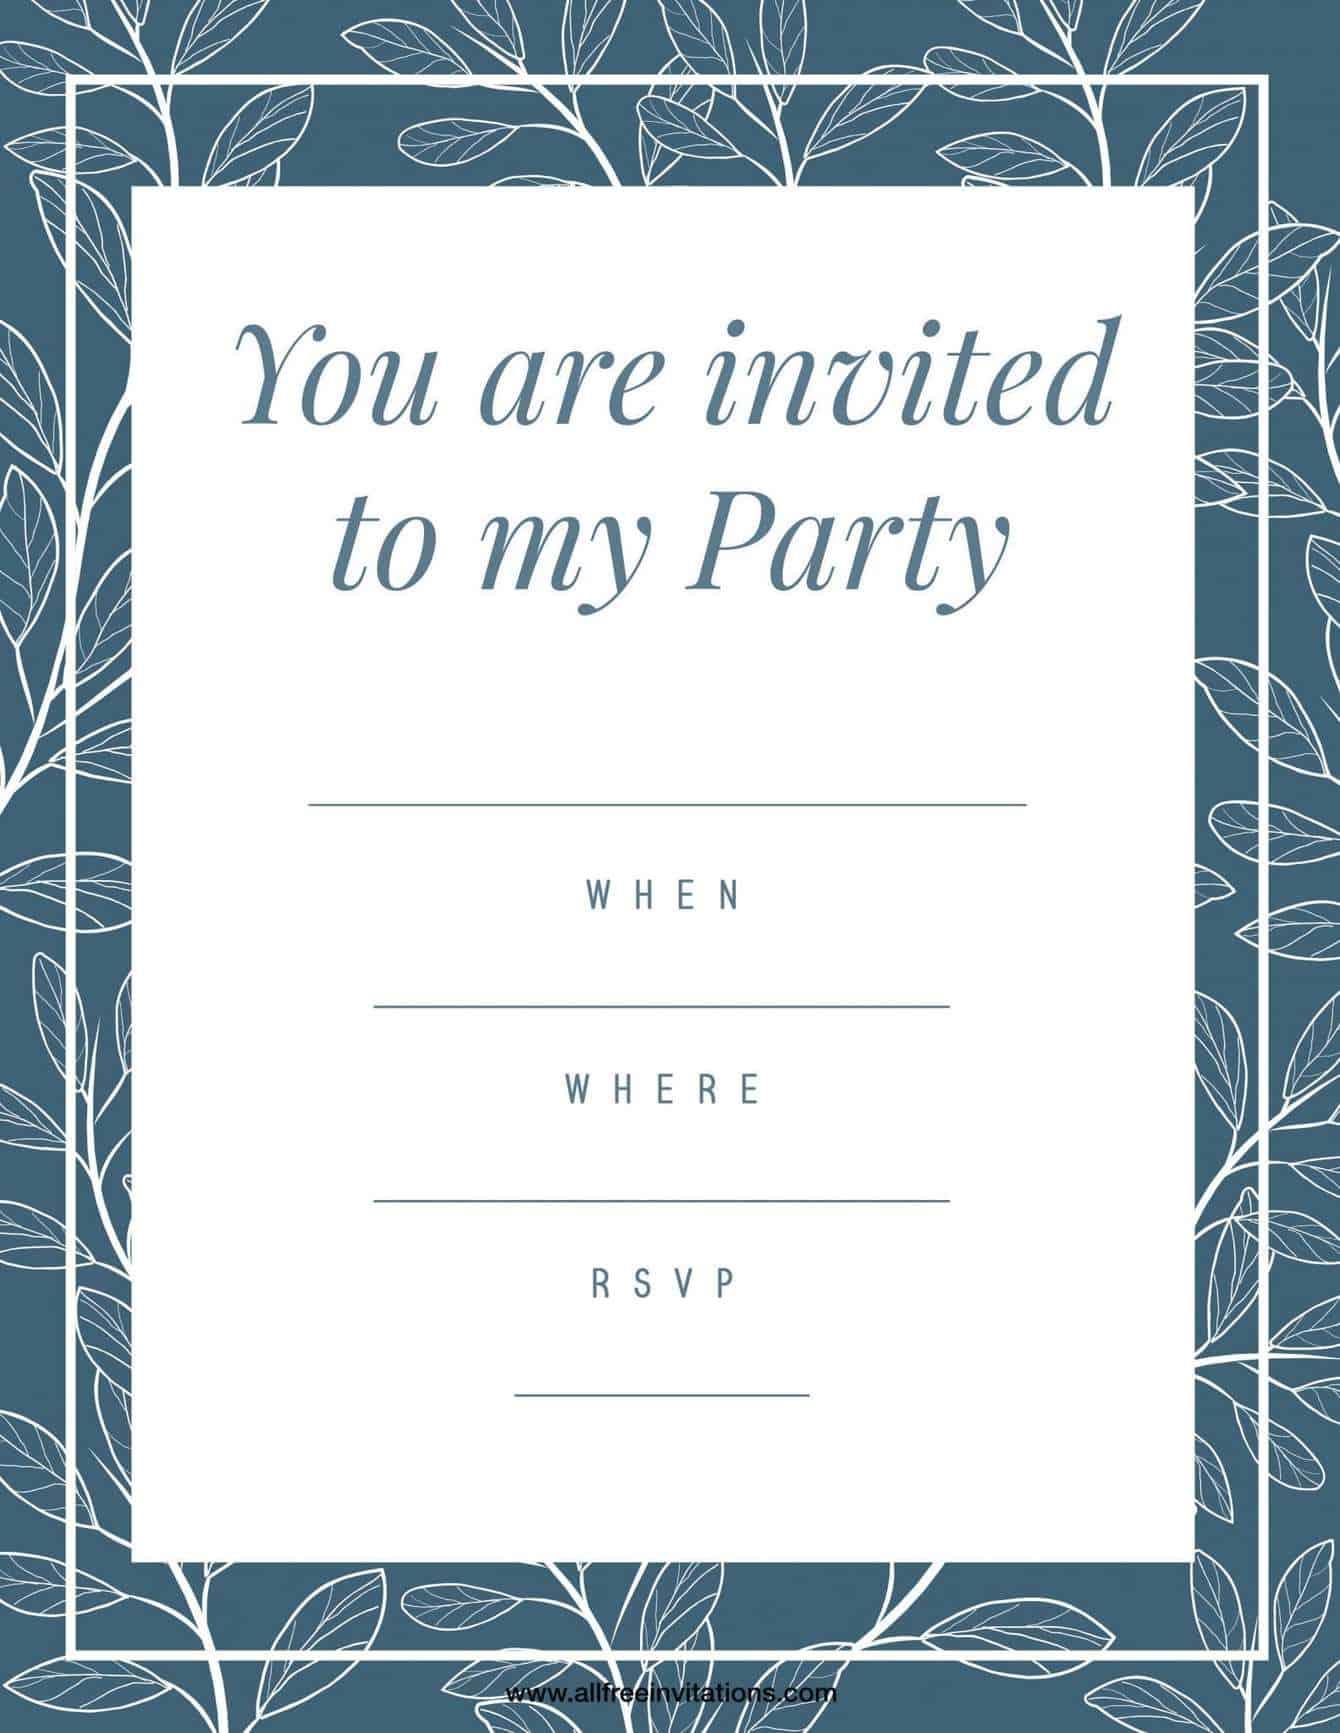 Birthday Party Invitation Blue Green Border Design